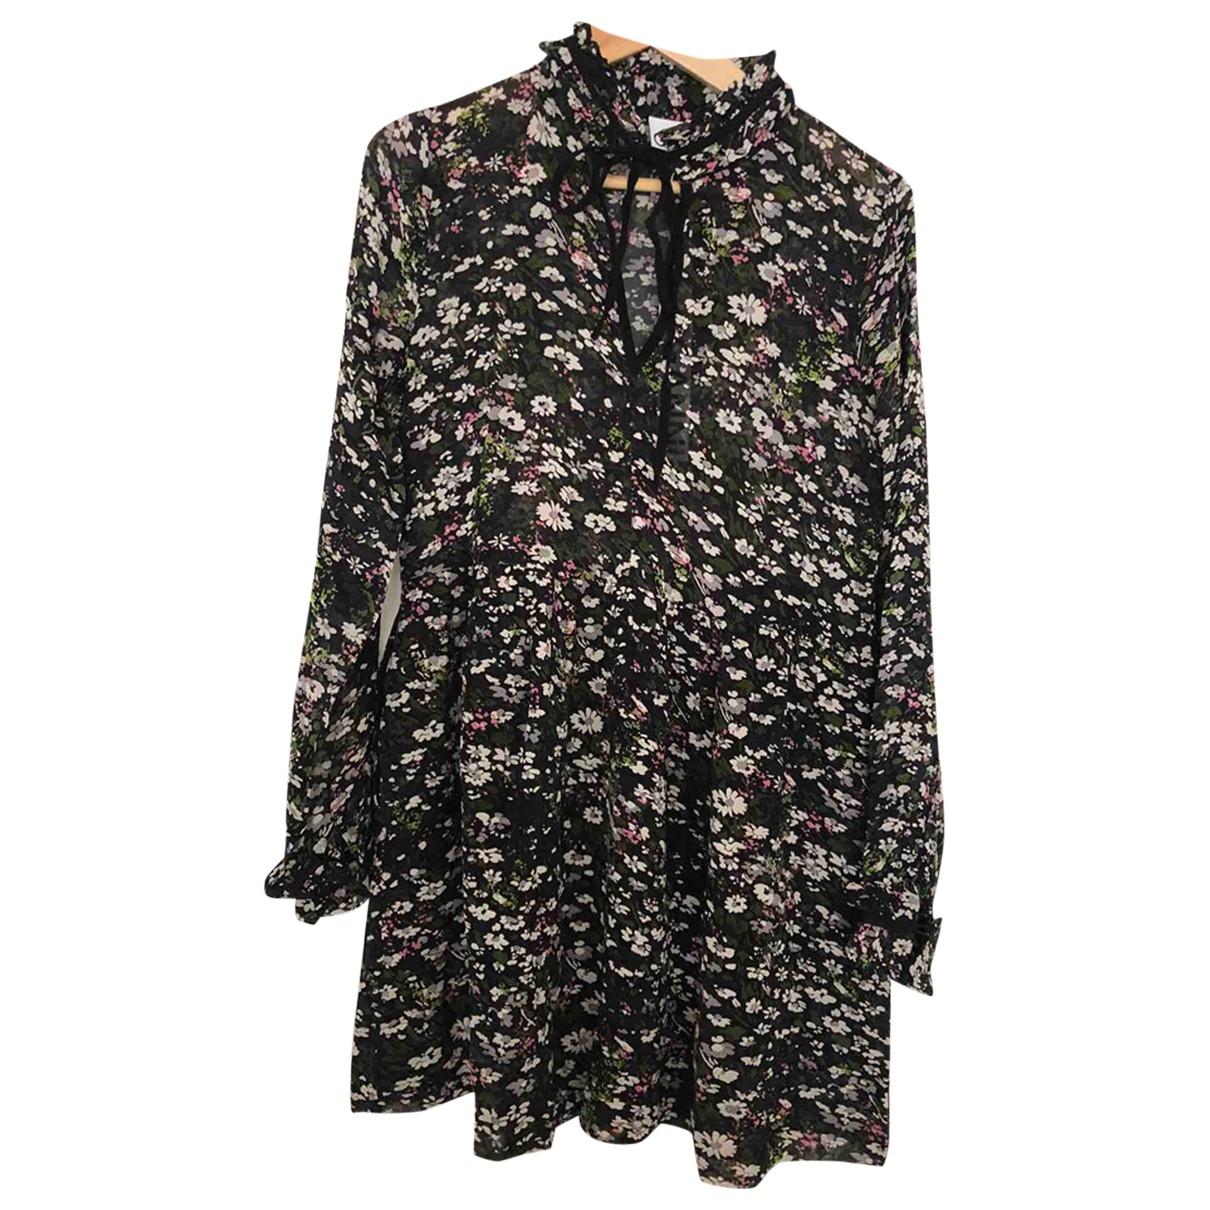 Ganni \N Black dress for Women 34 FR